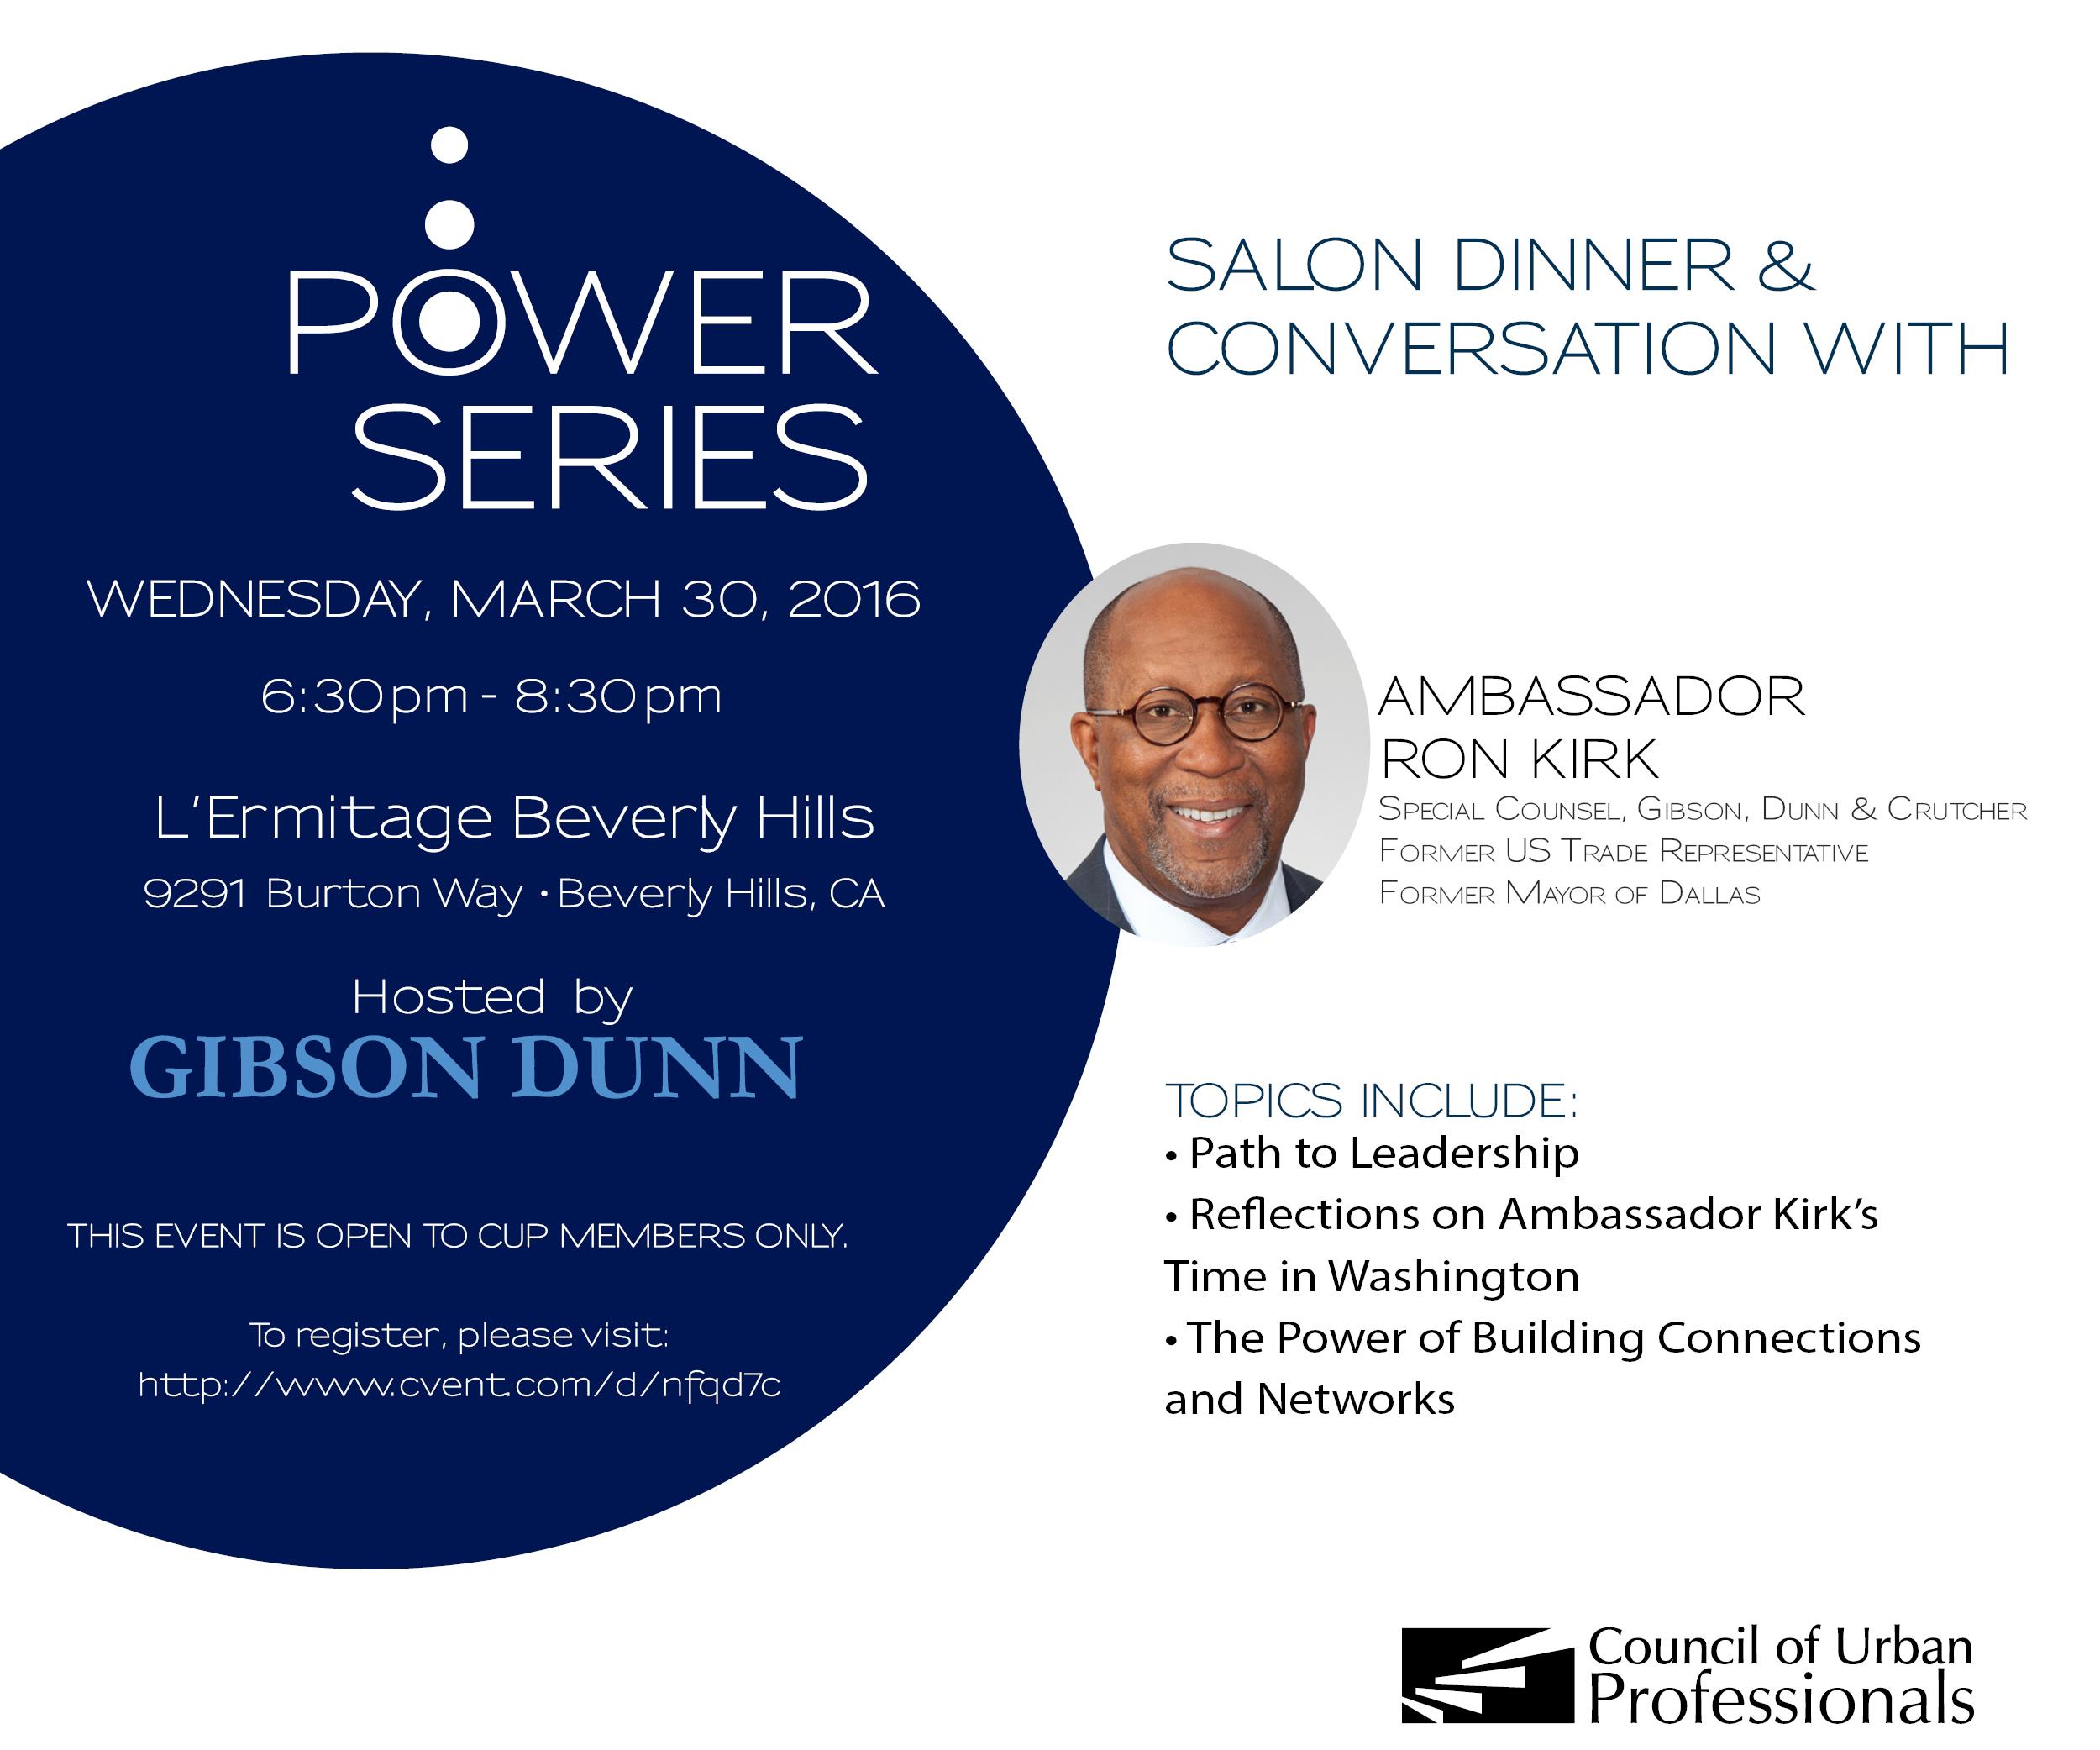 Salon Dinner & Conversation with Ambassador Ron Kirk